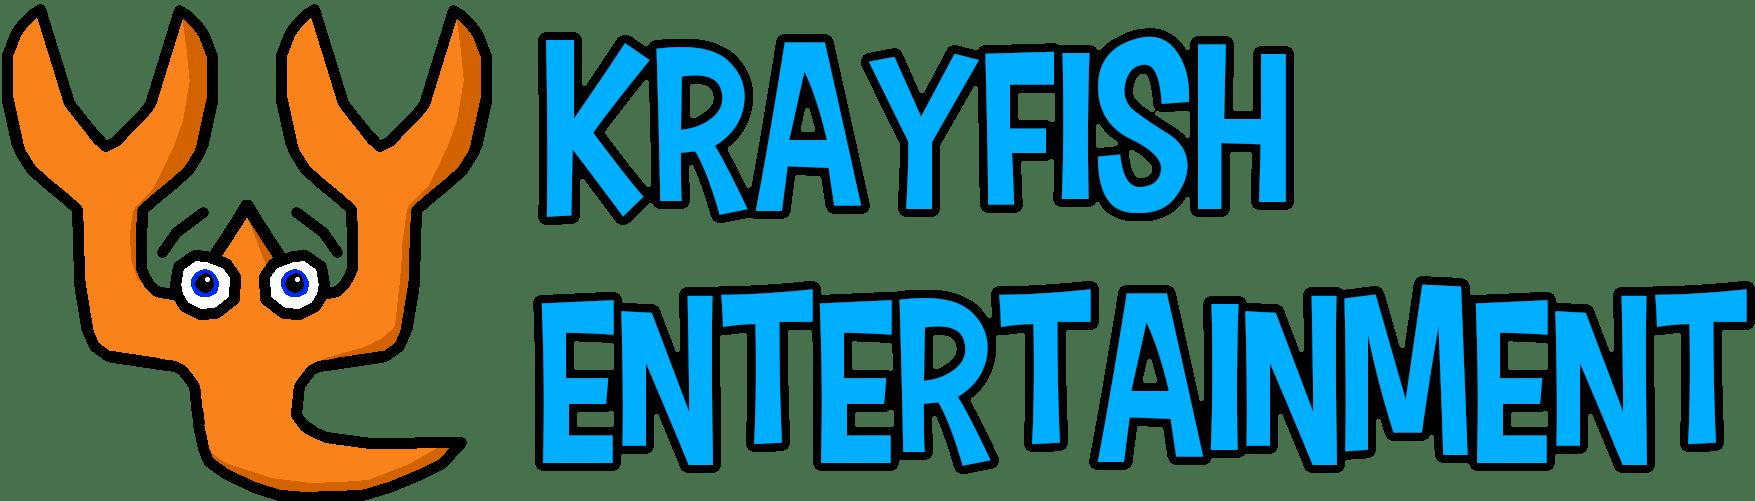 Krayfish Entertainment